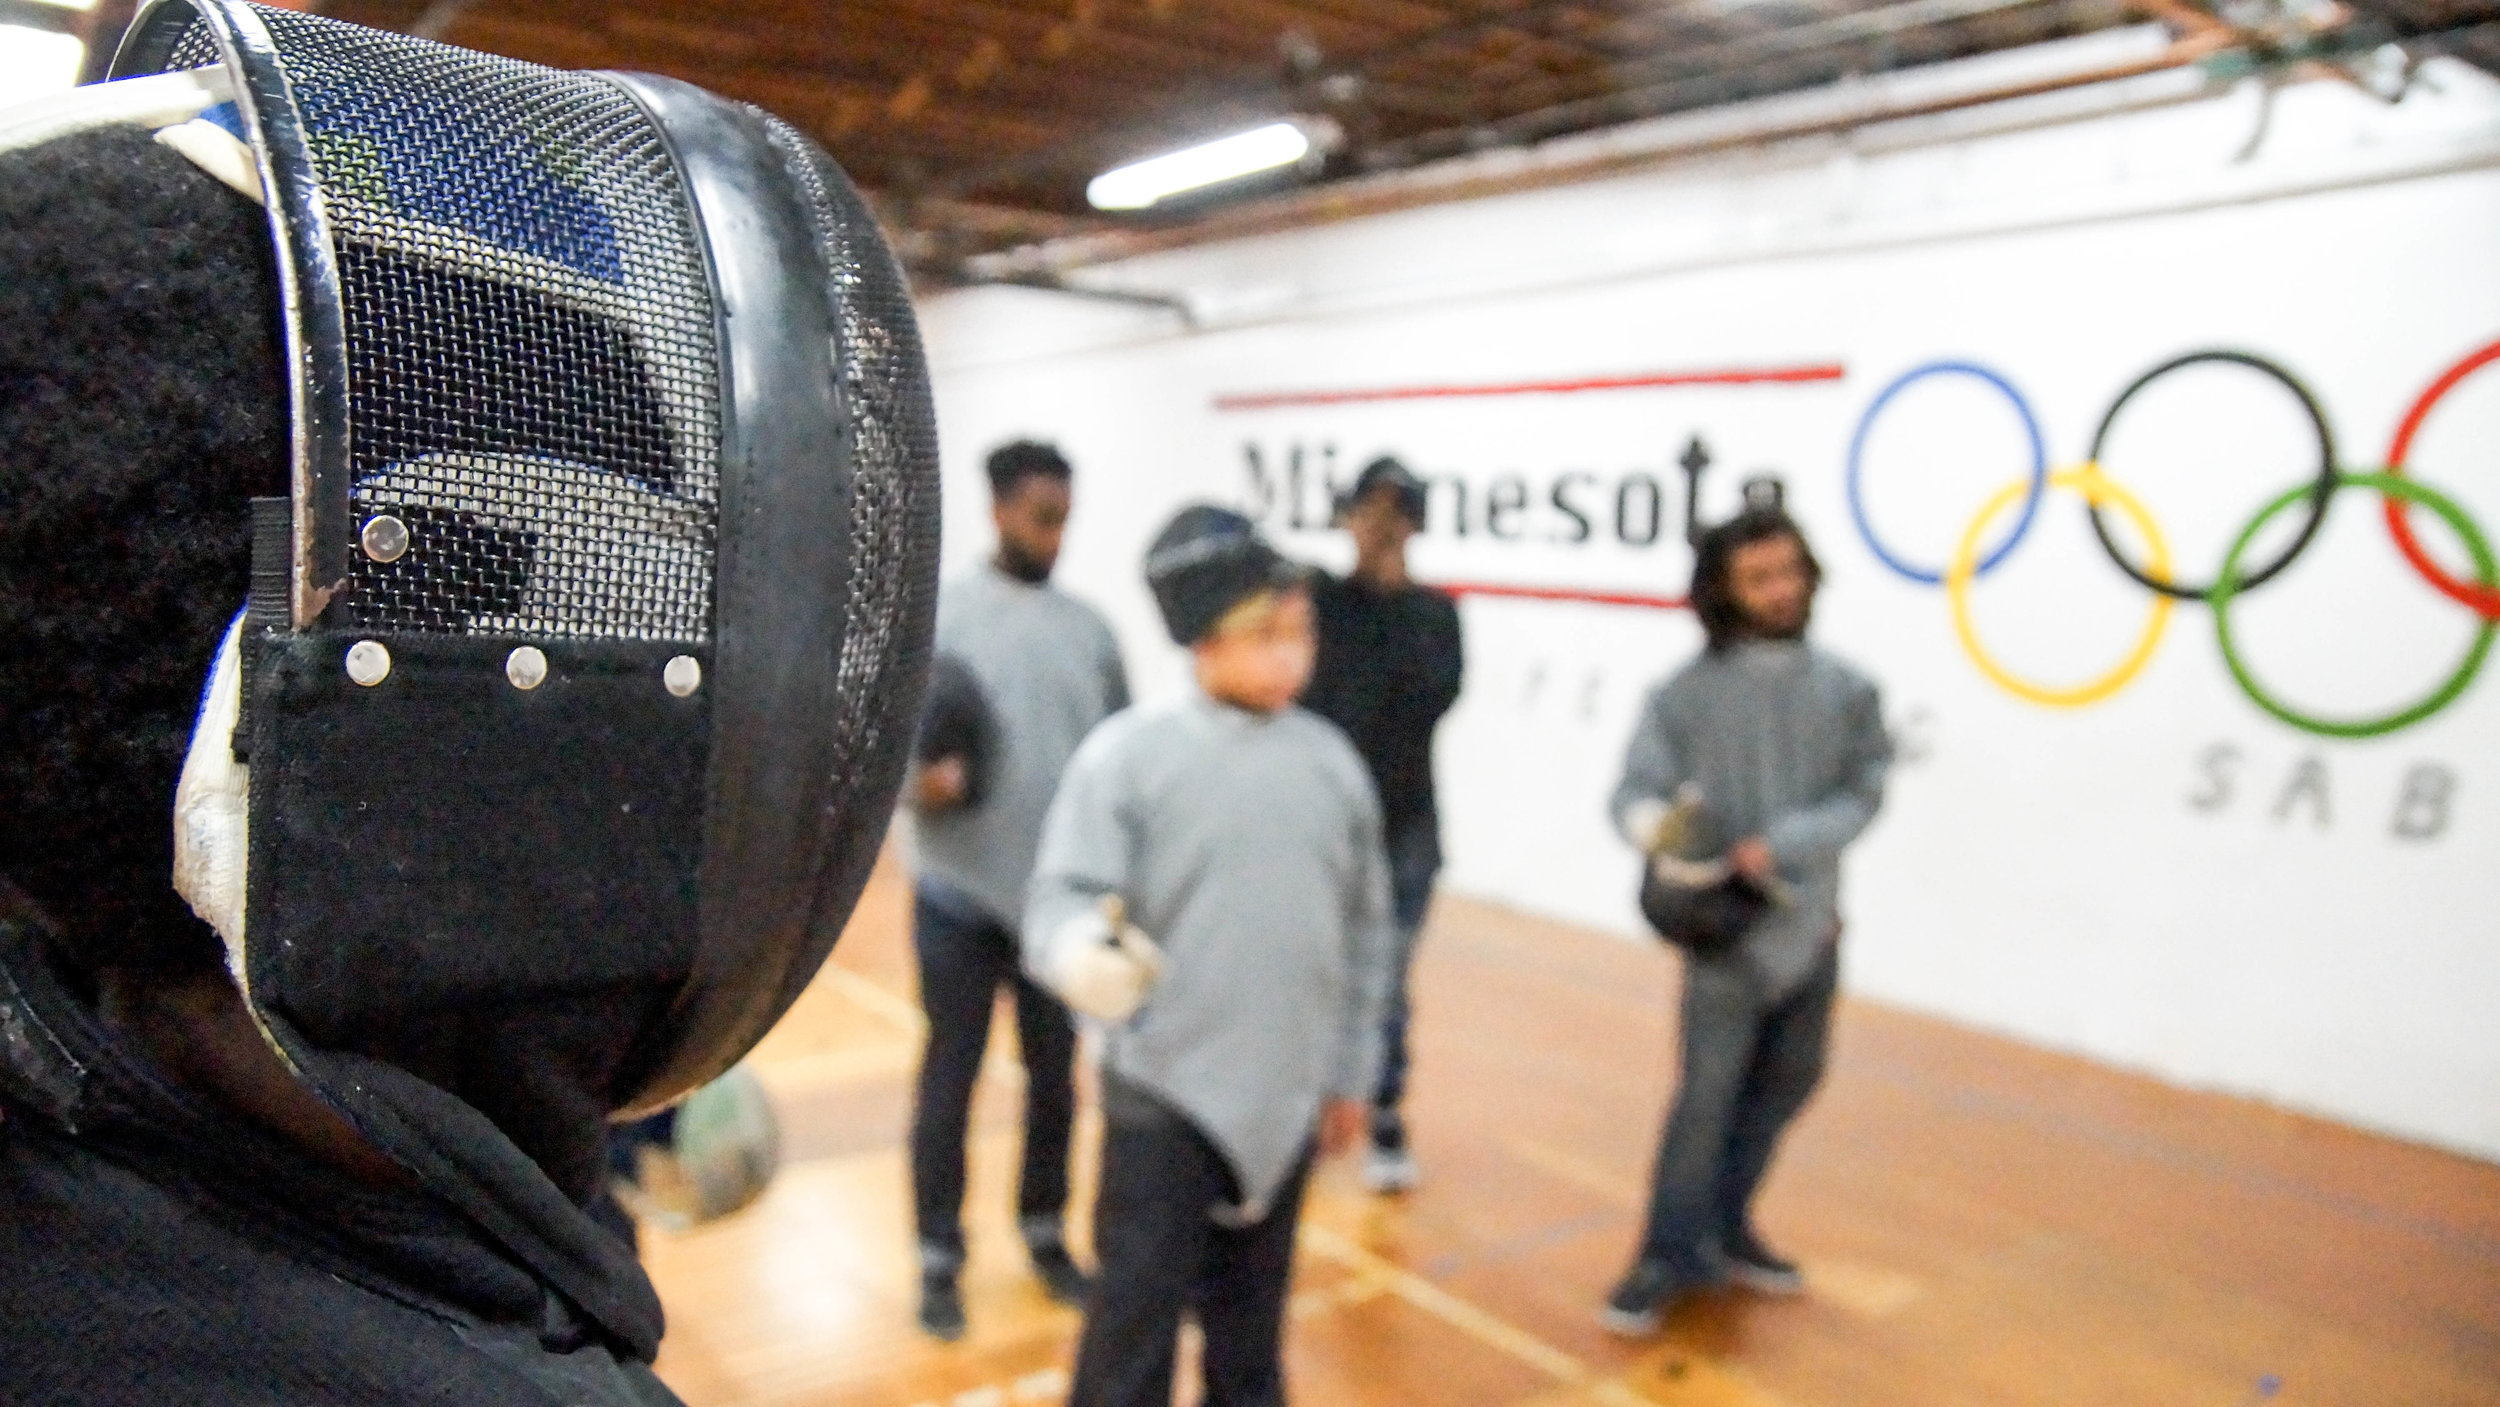 New Lens Urban Mentoring Society